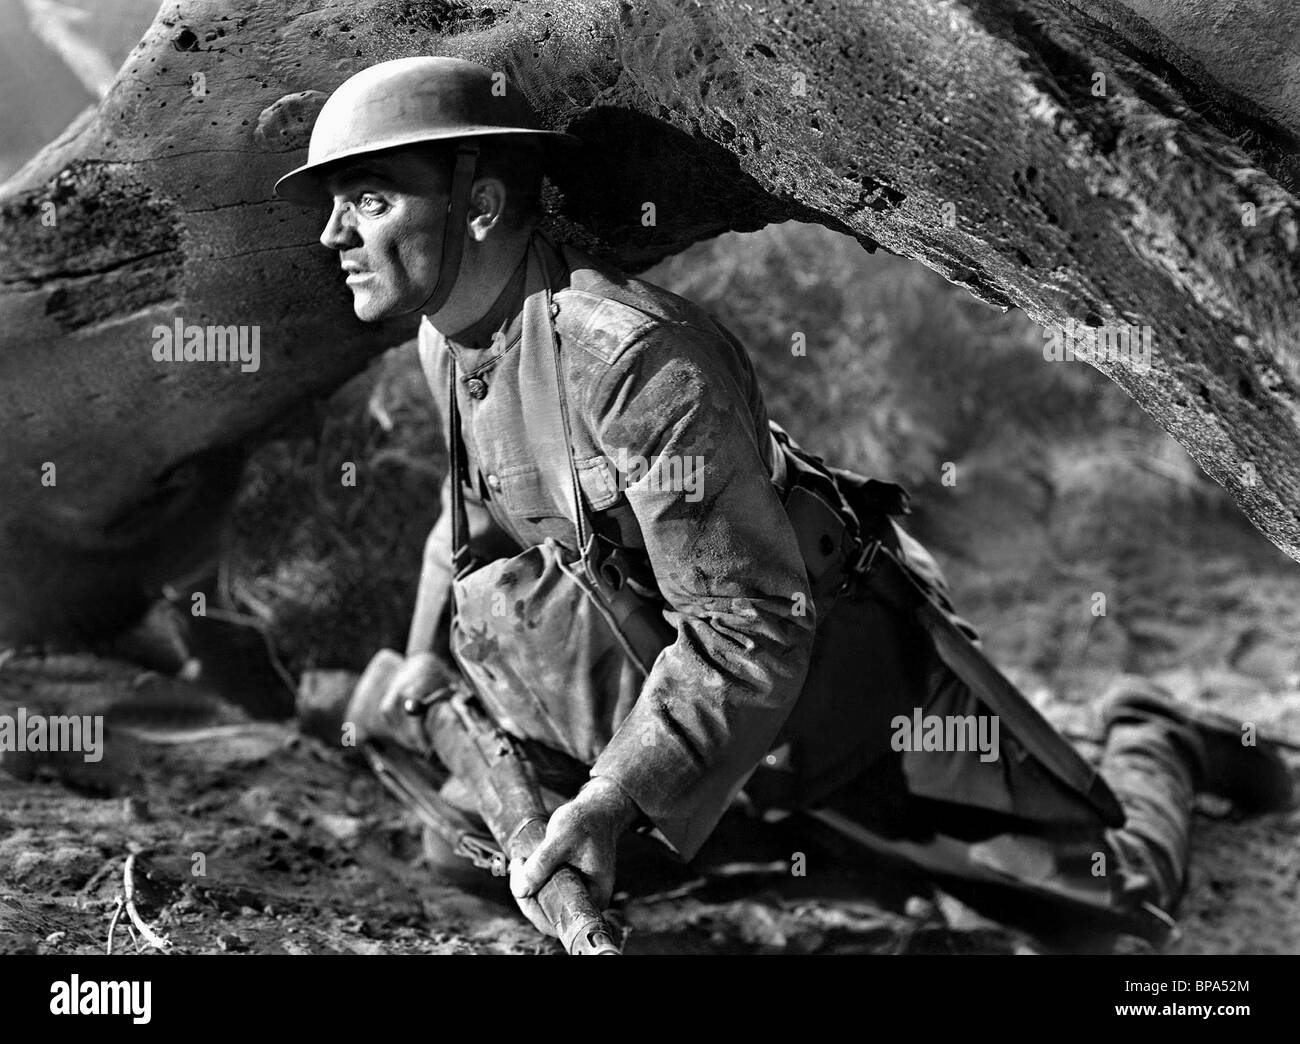 JAMES CAGNEY THE ROARING TWENTIES (1939) - Stock Image